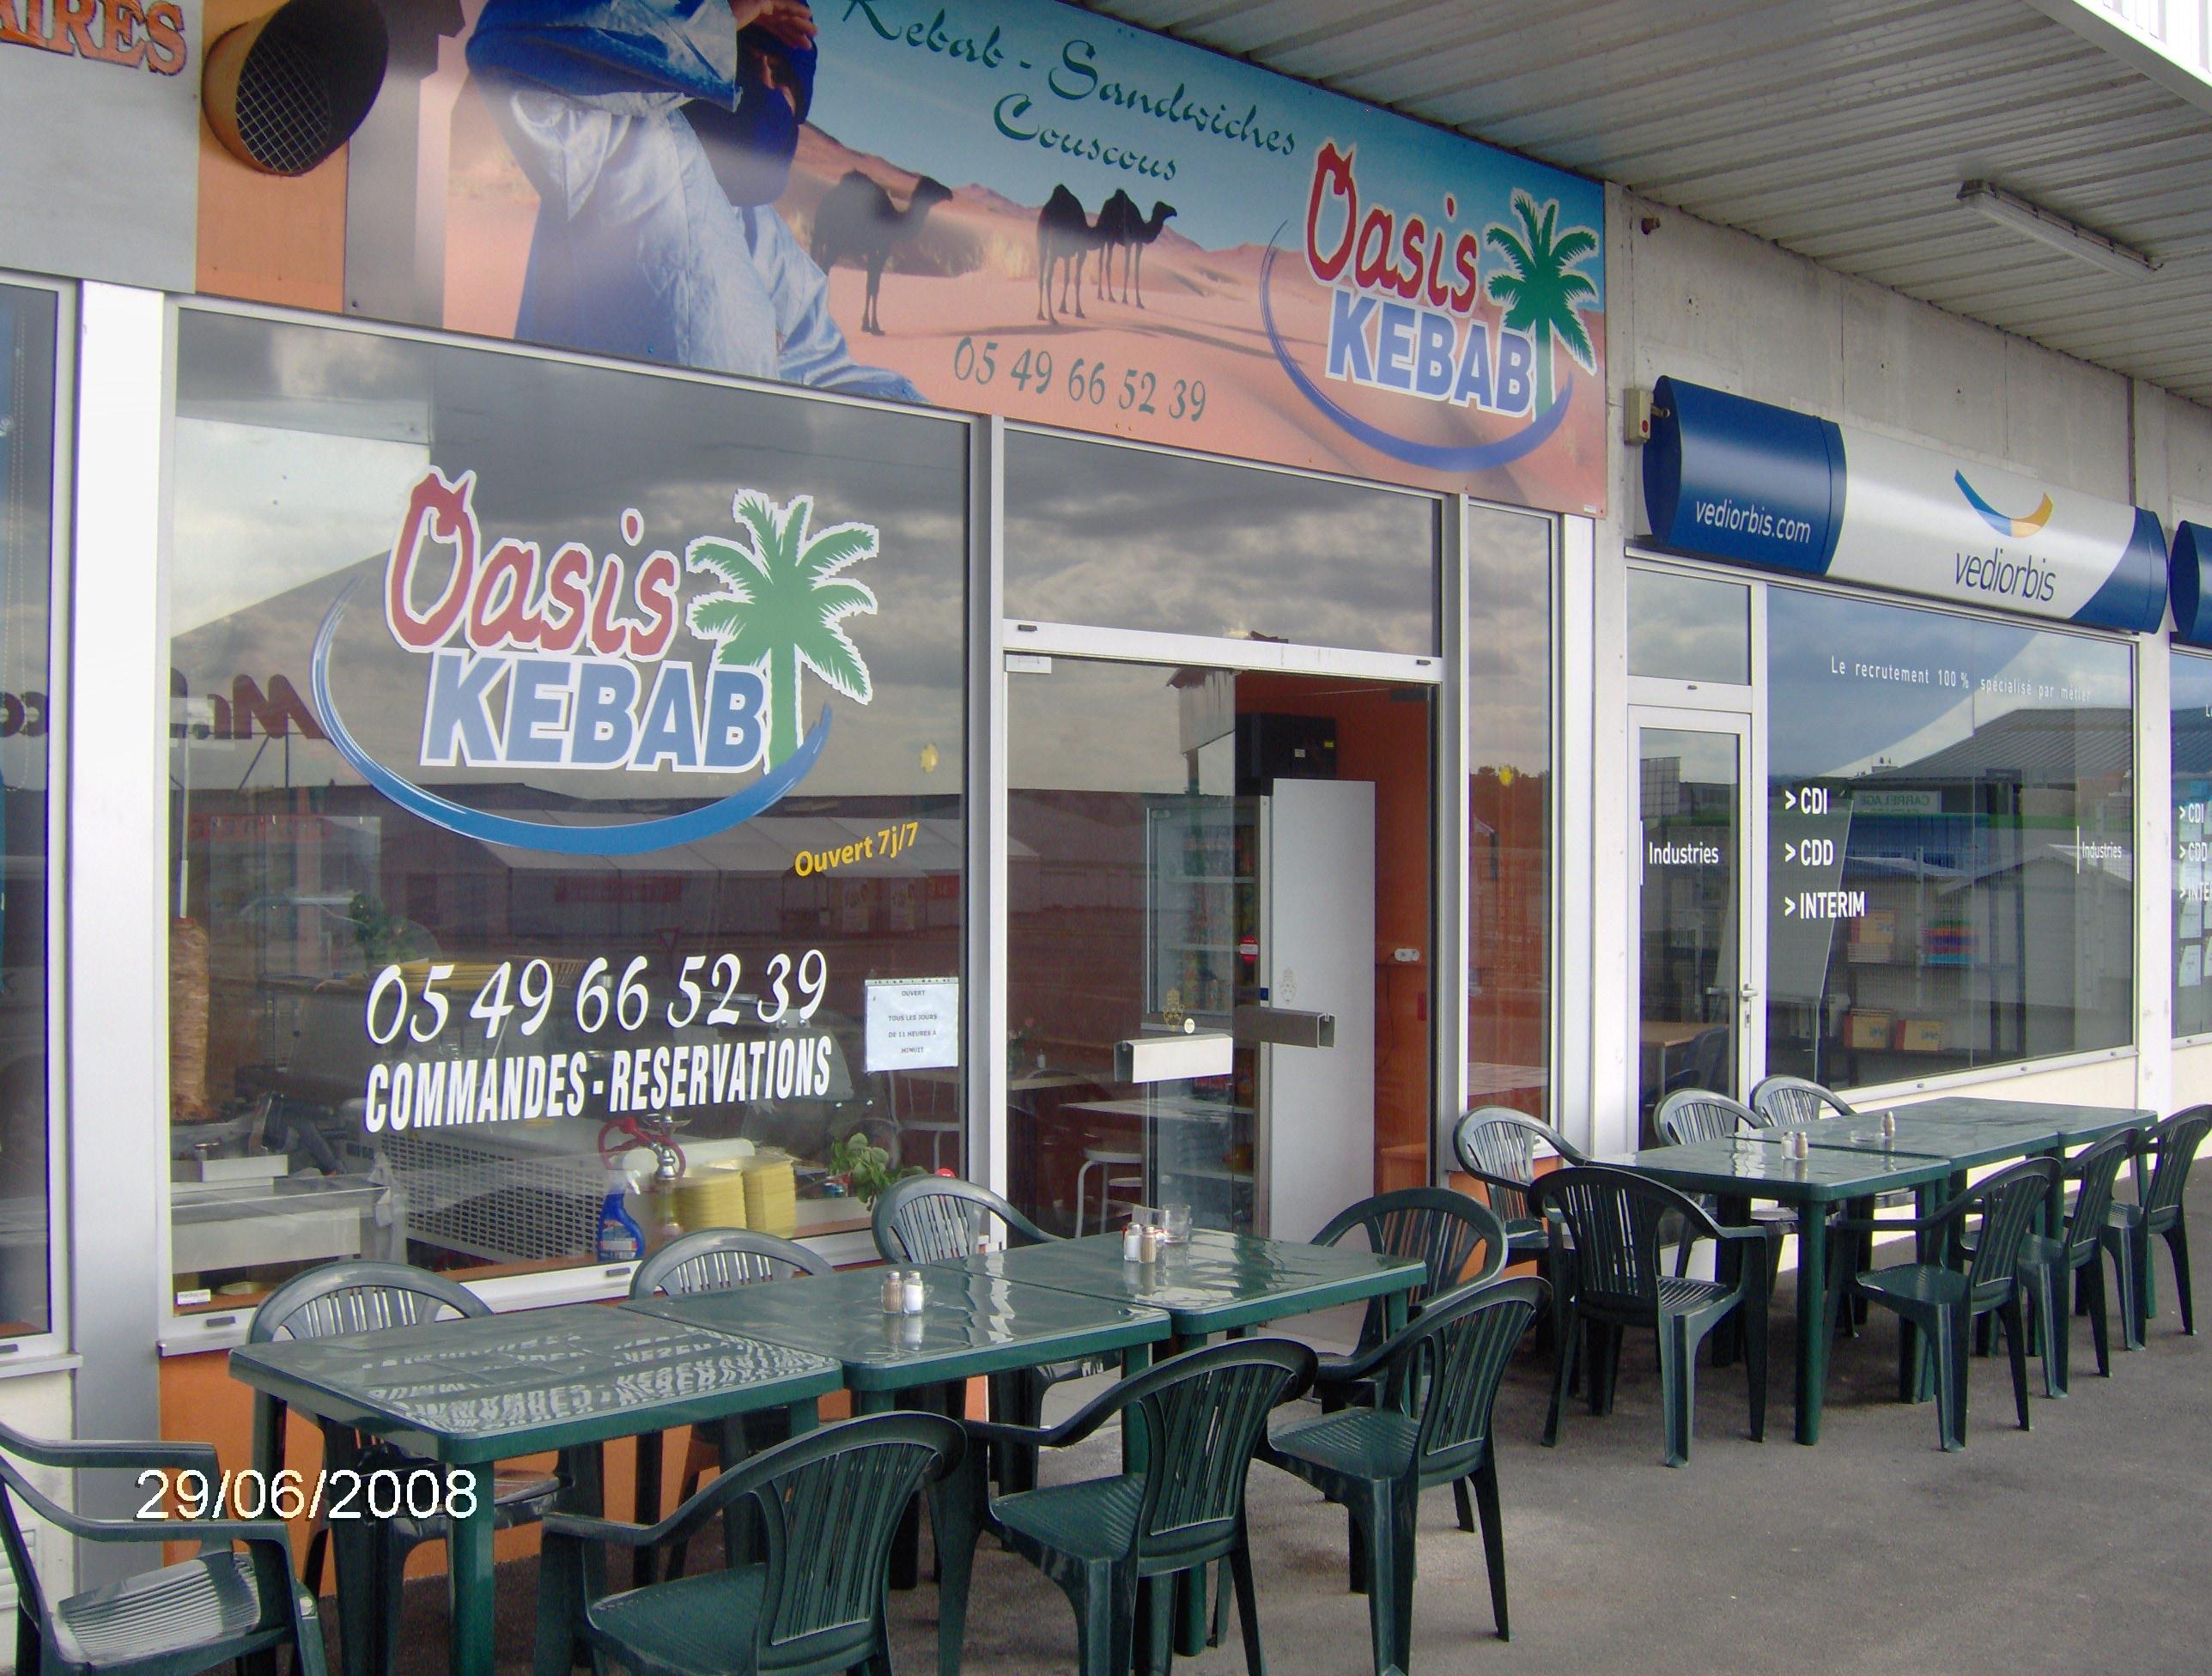 Oasis kebab à Sainte-Verge